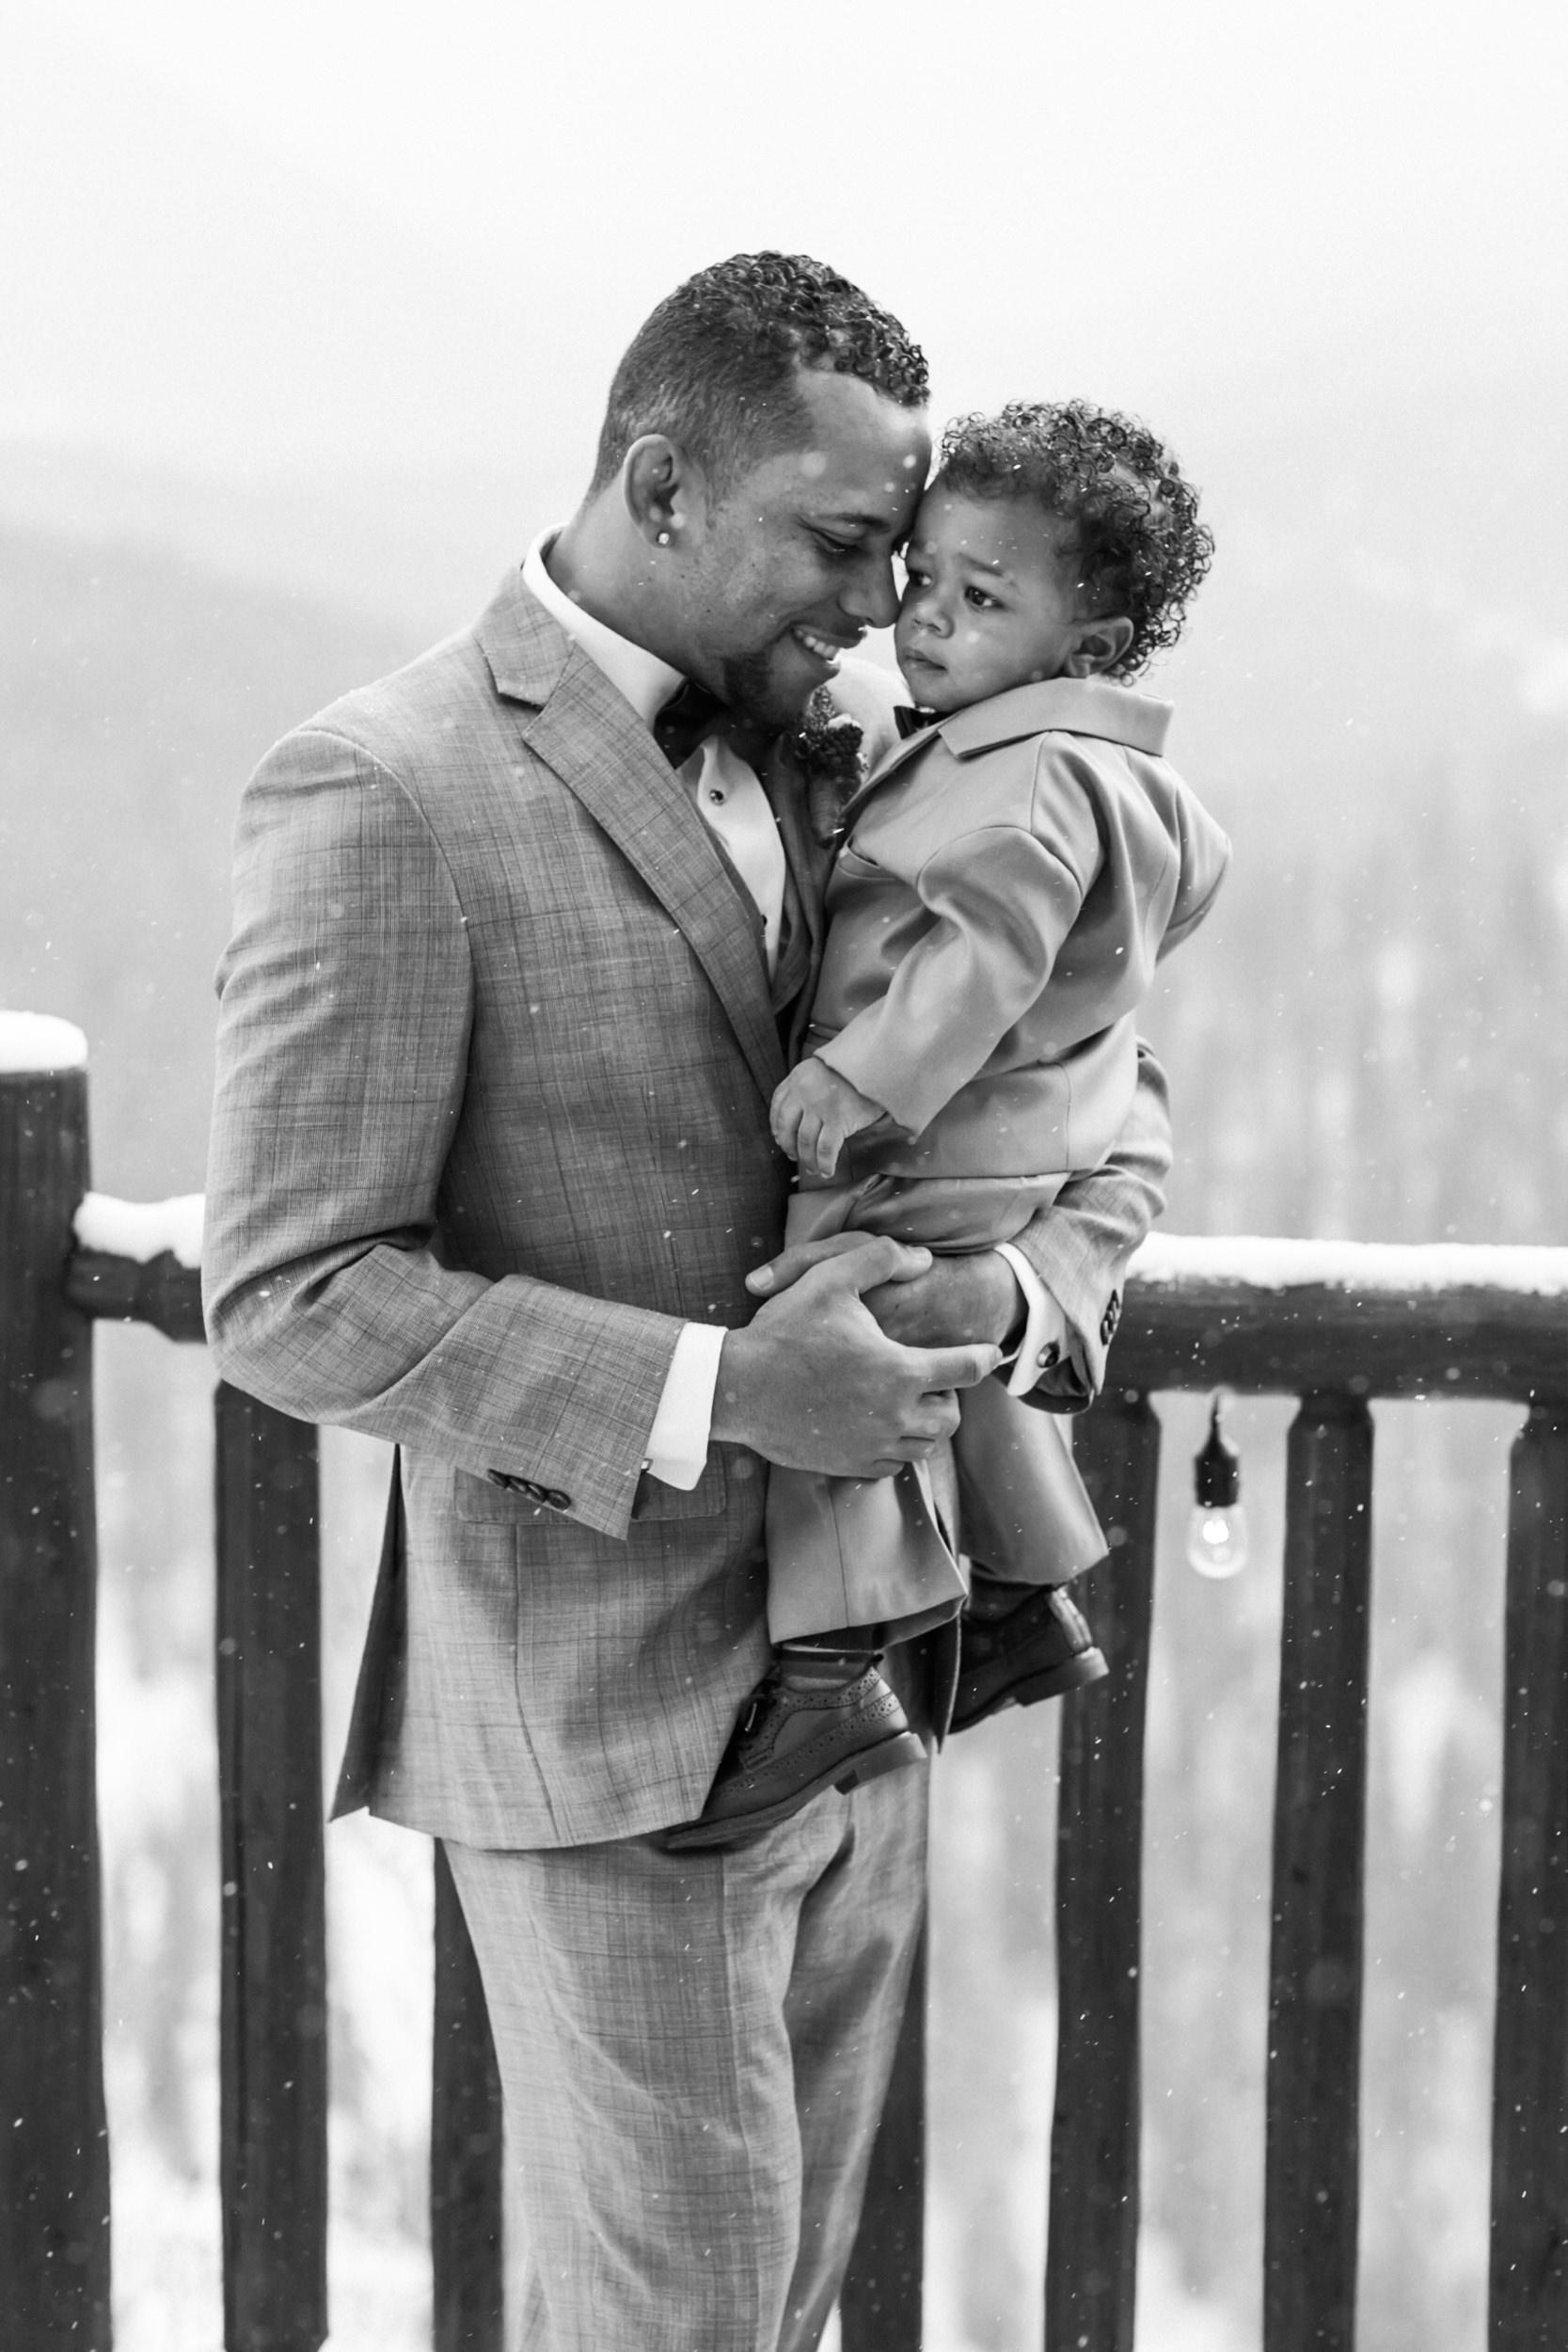 Colorado-Wedding-Photographer-Breckinridge-Mountain-Adventure-Elopement-50.jpg